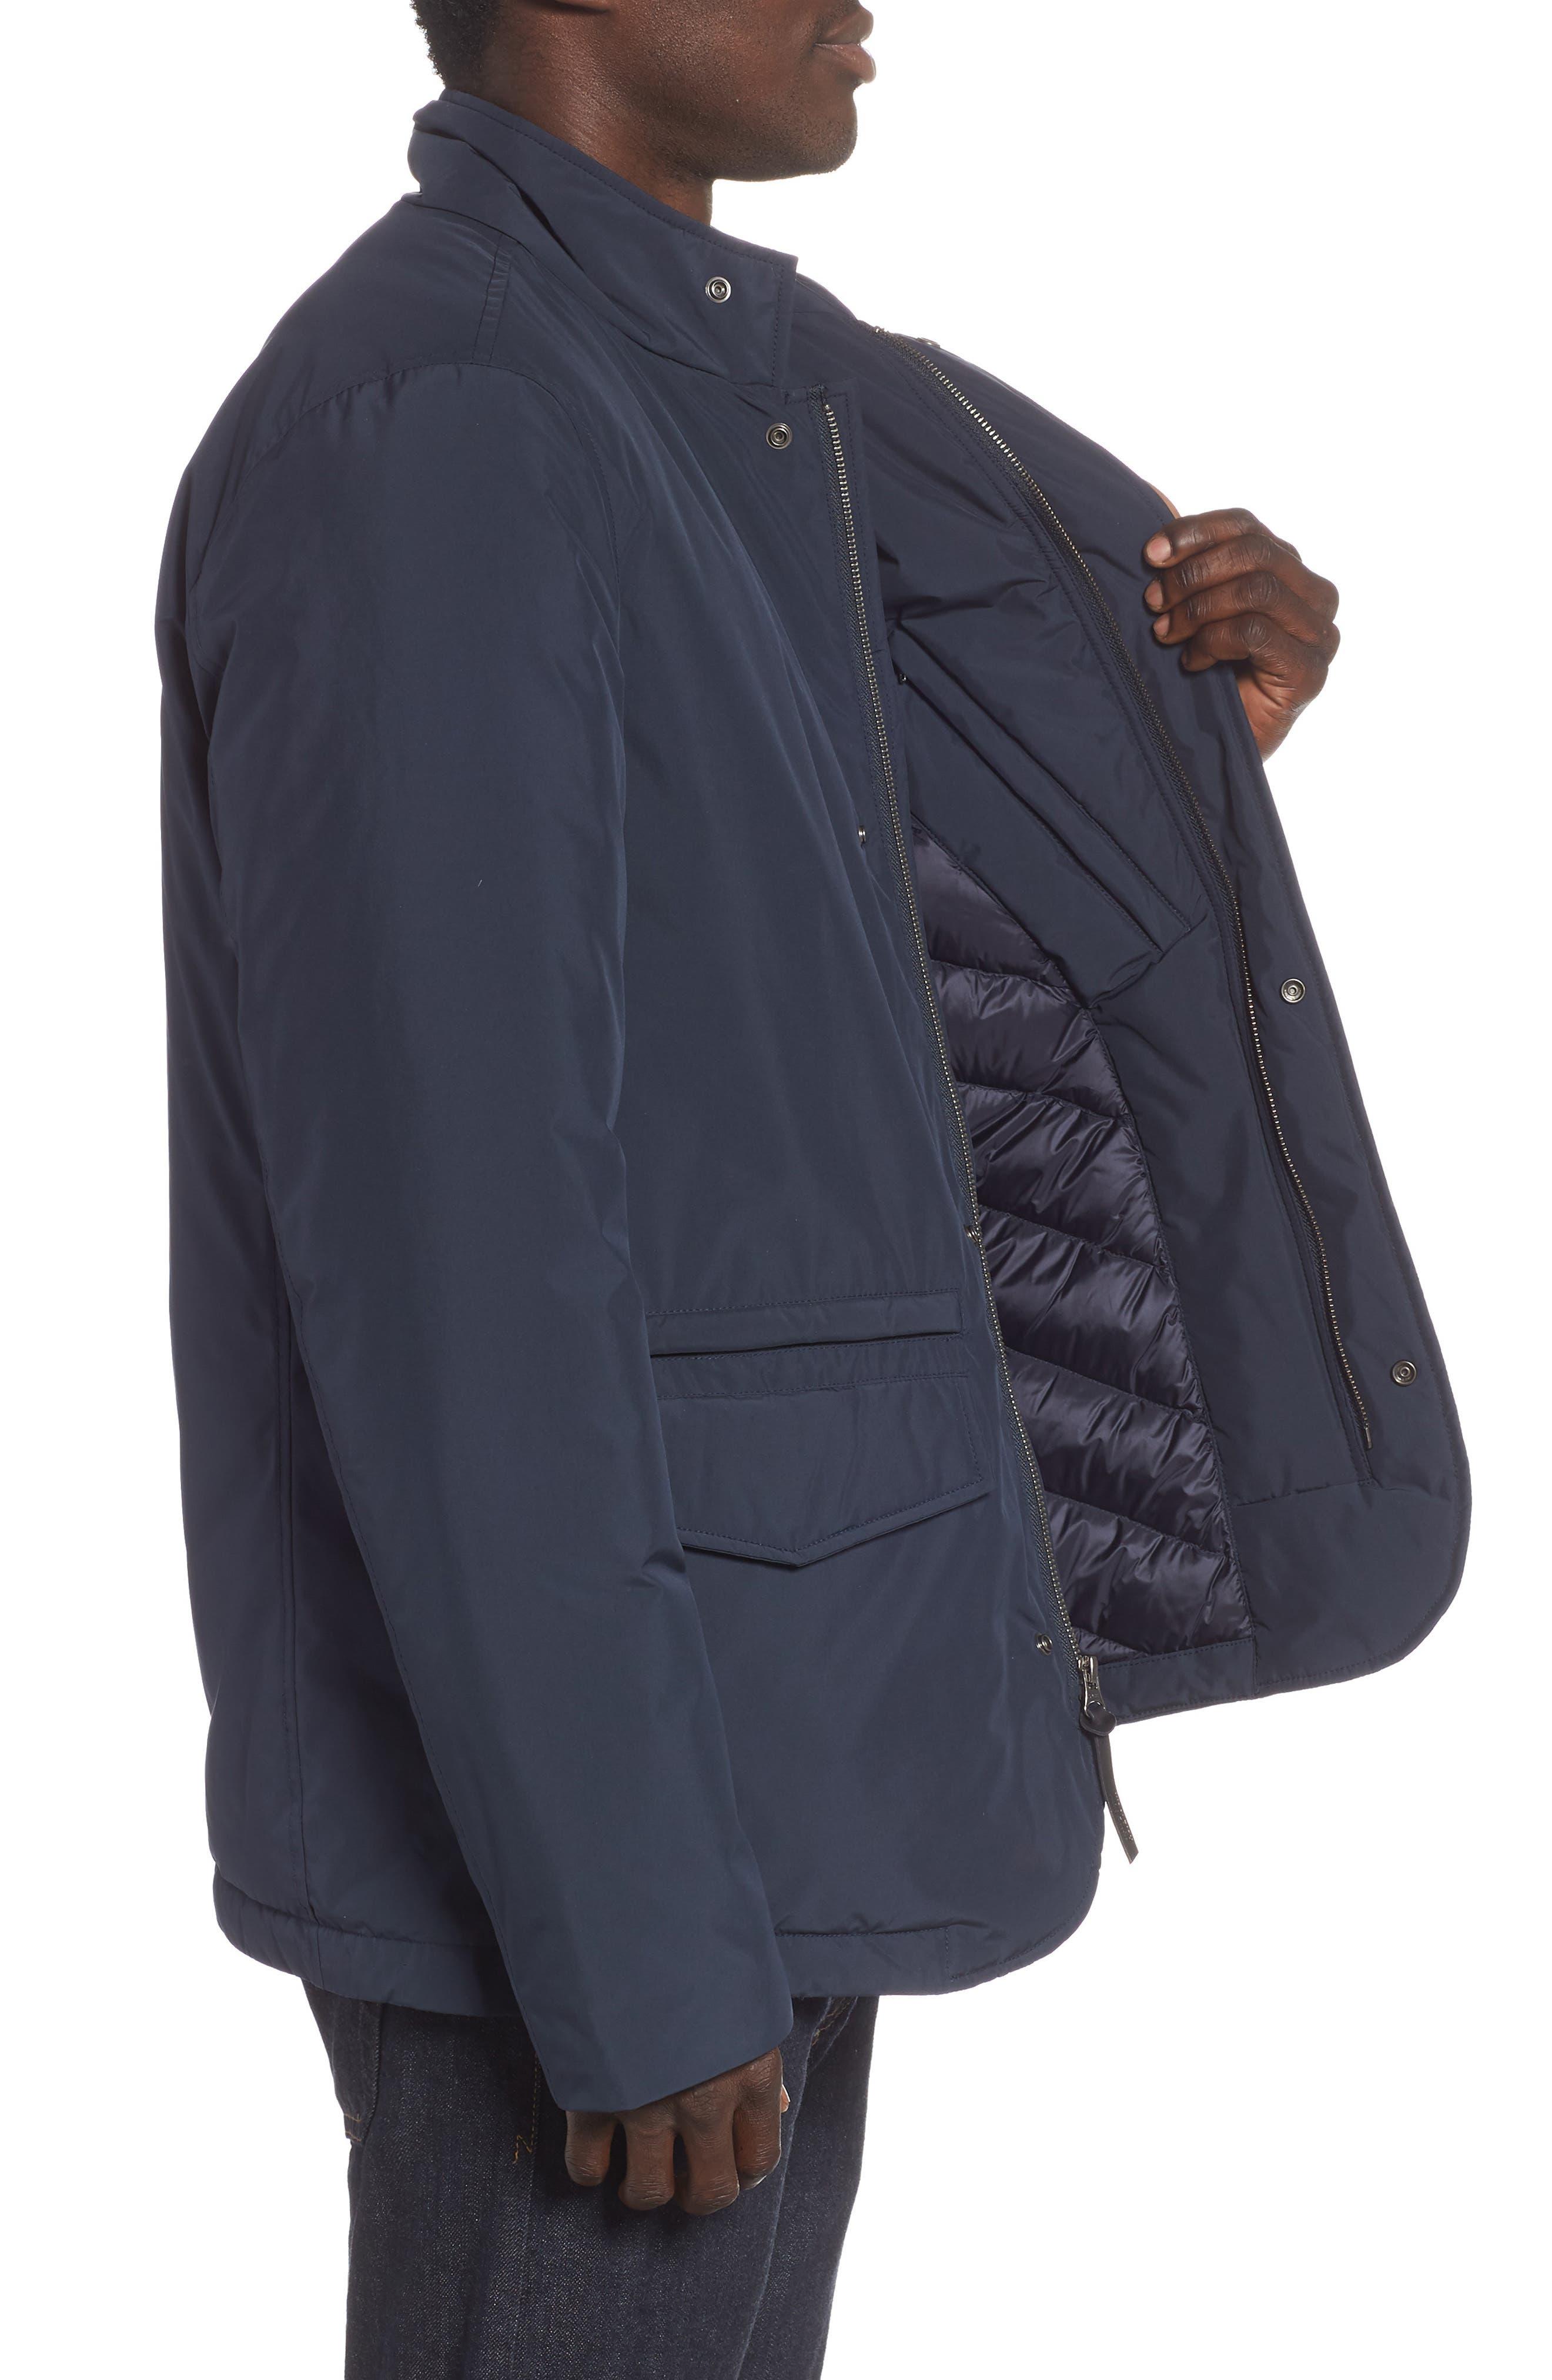 City Down Jacket,                             Alternate thumbnail 3, color,                             MELTON BLUE